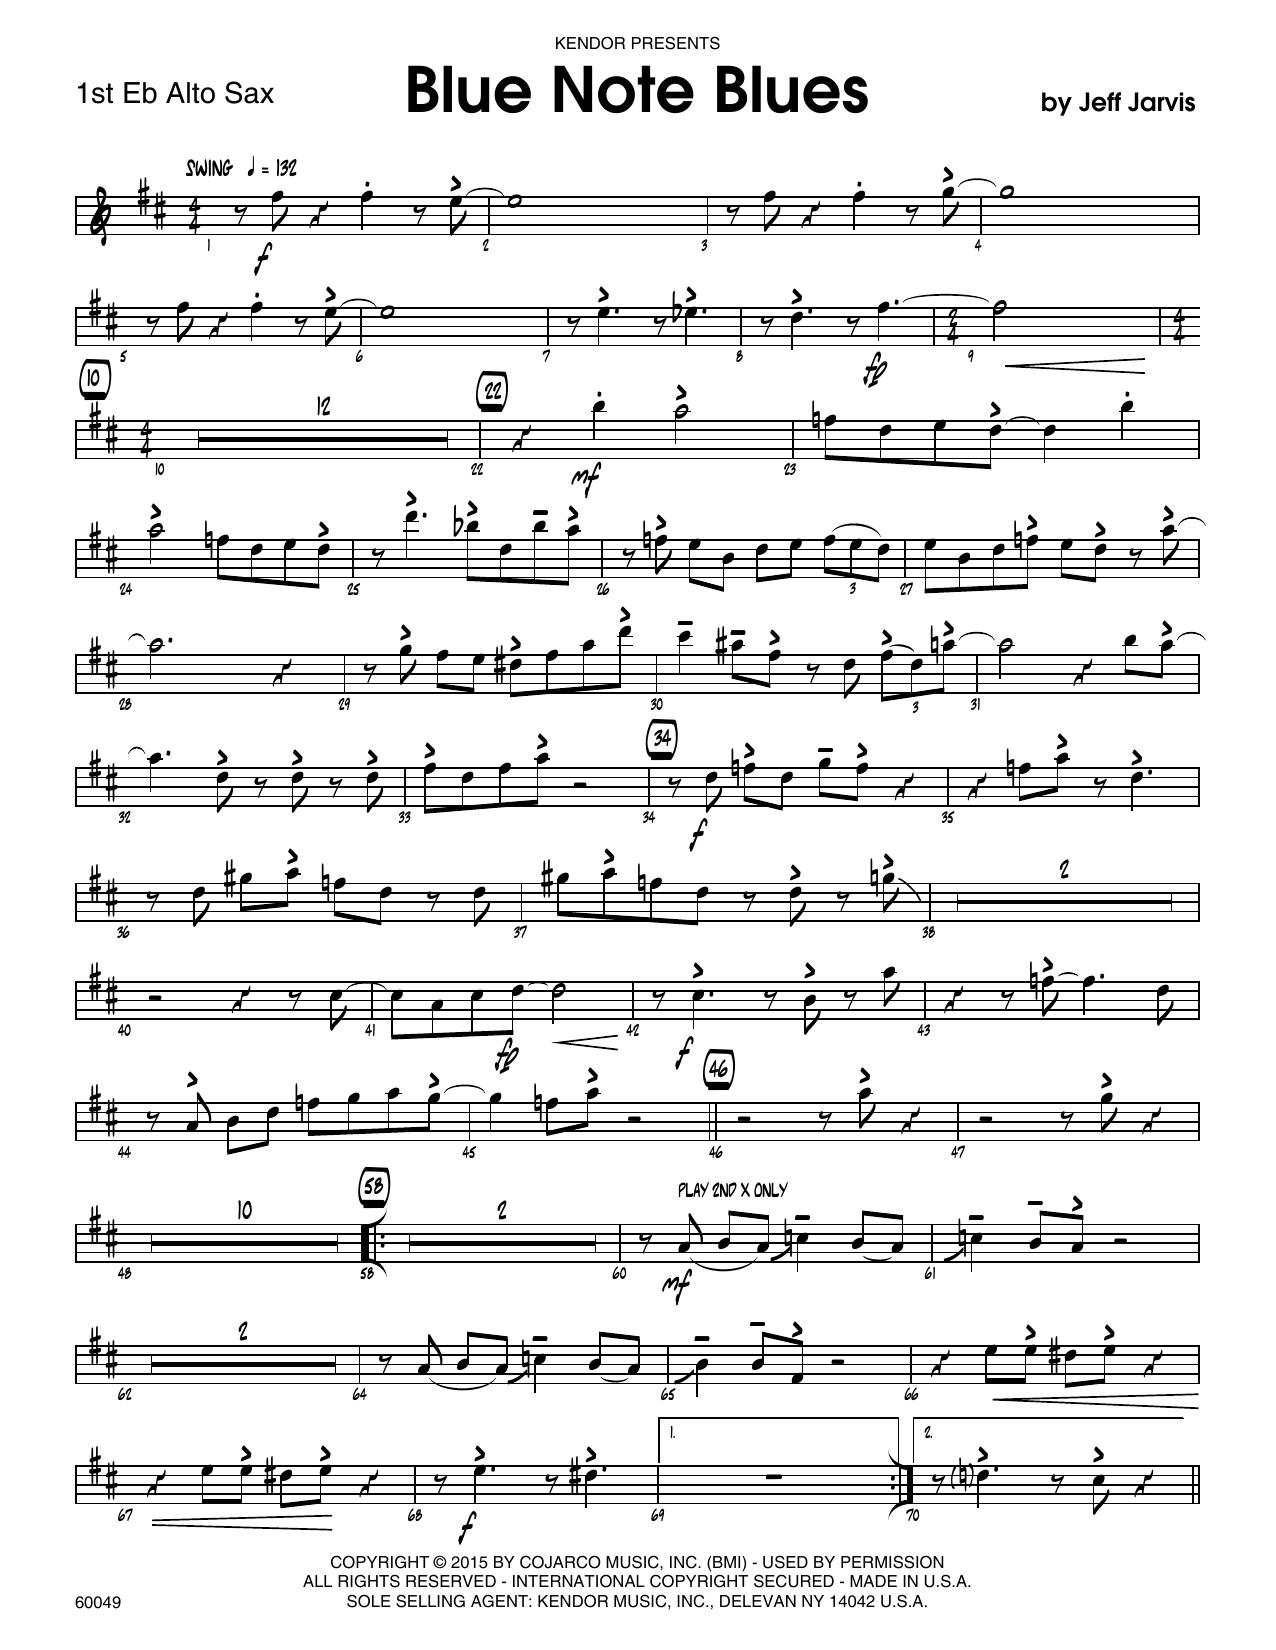 Blue Note Blues - 1st Eb Alto Saxophone by Jeff Jarvis Jazz Ensemble  Digital Sheet Music